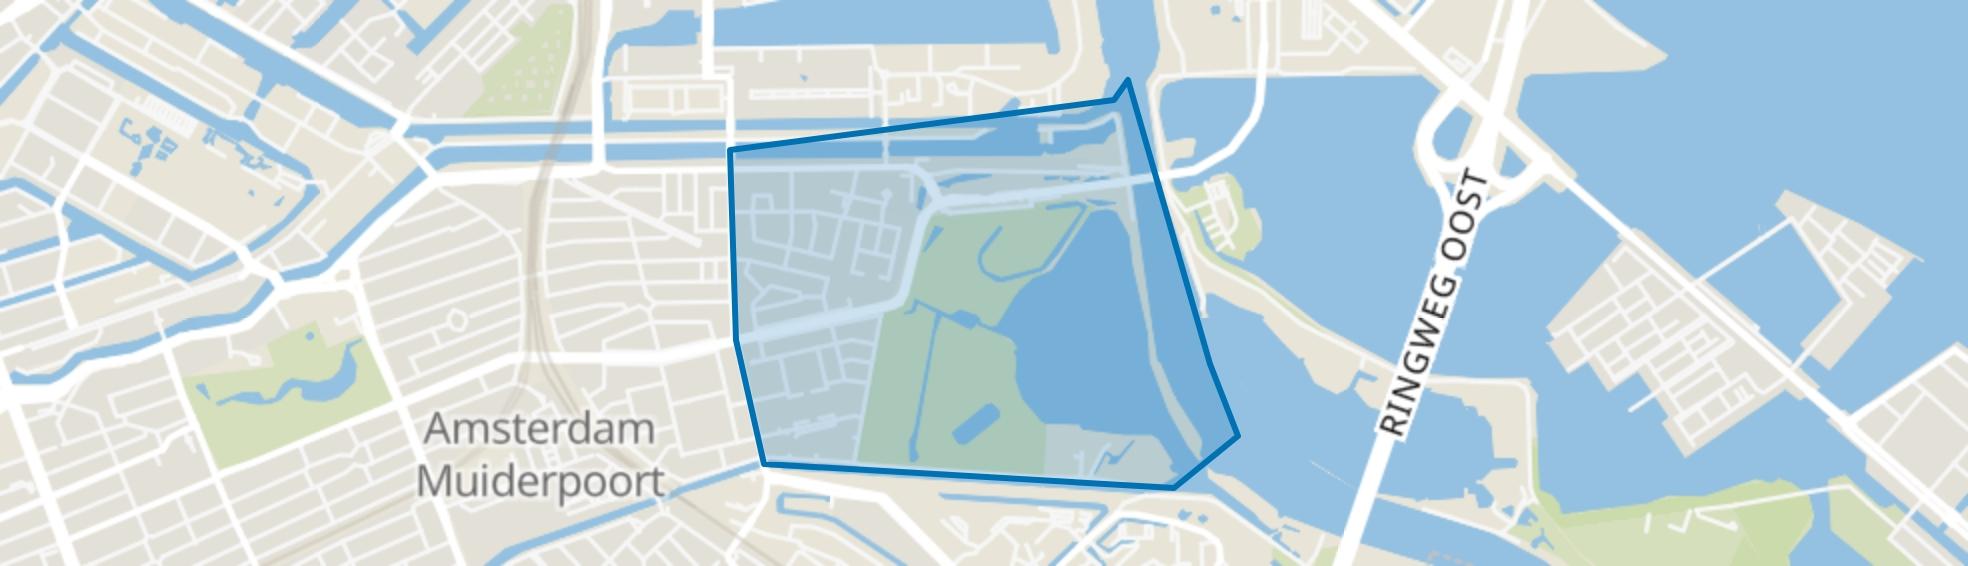 Indische Buurt Oost, Amsterdam map